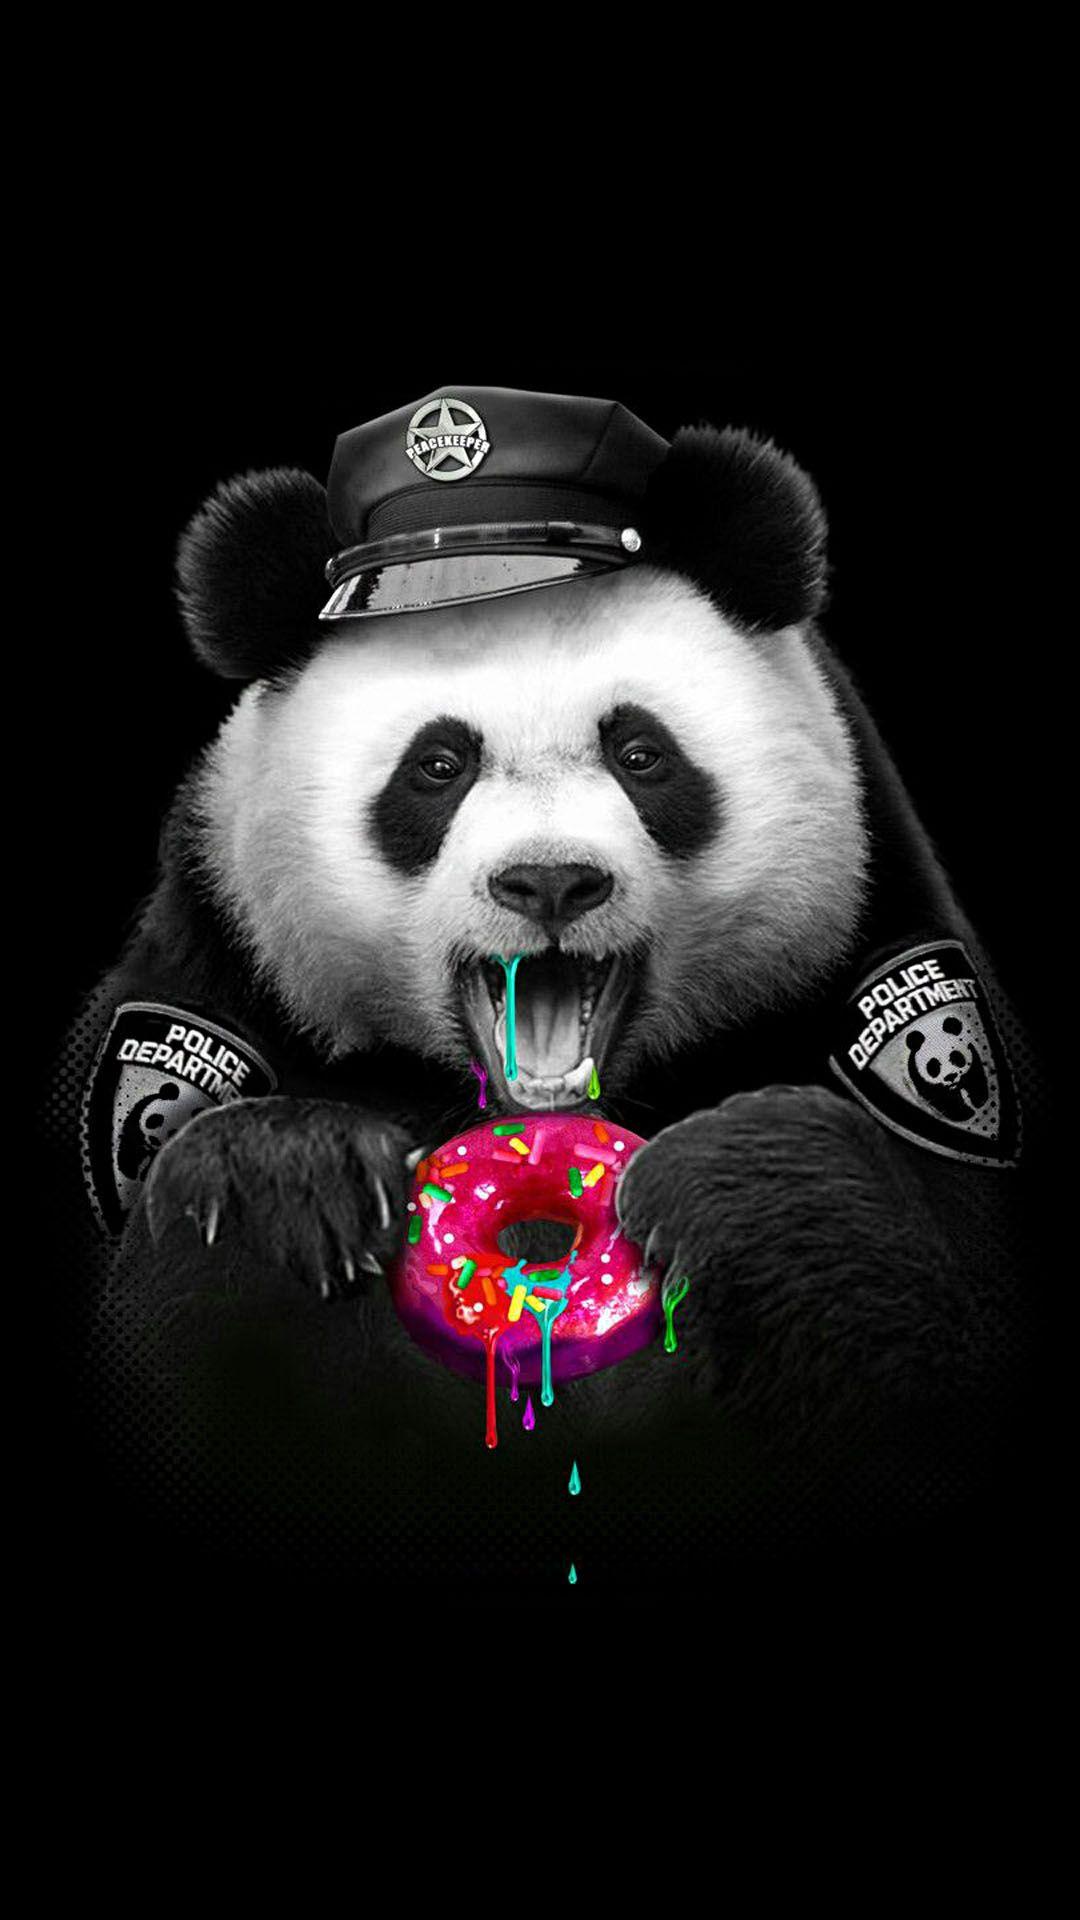 Black Panda Background Image in 2020 Panda wallpapers